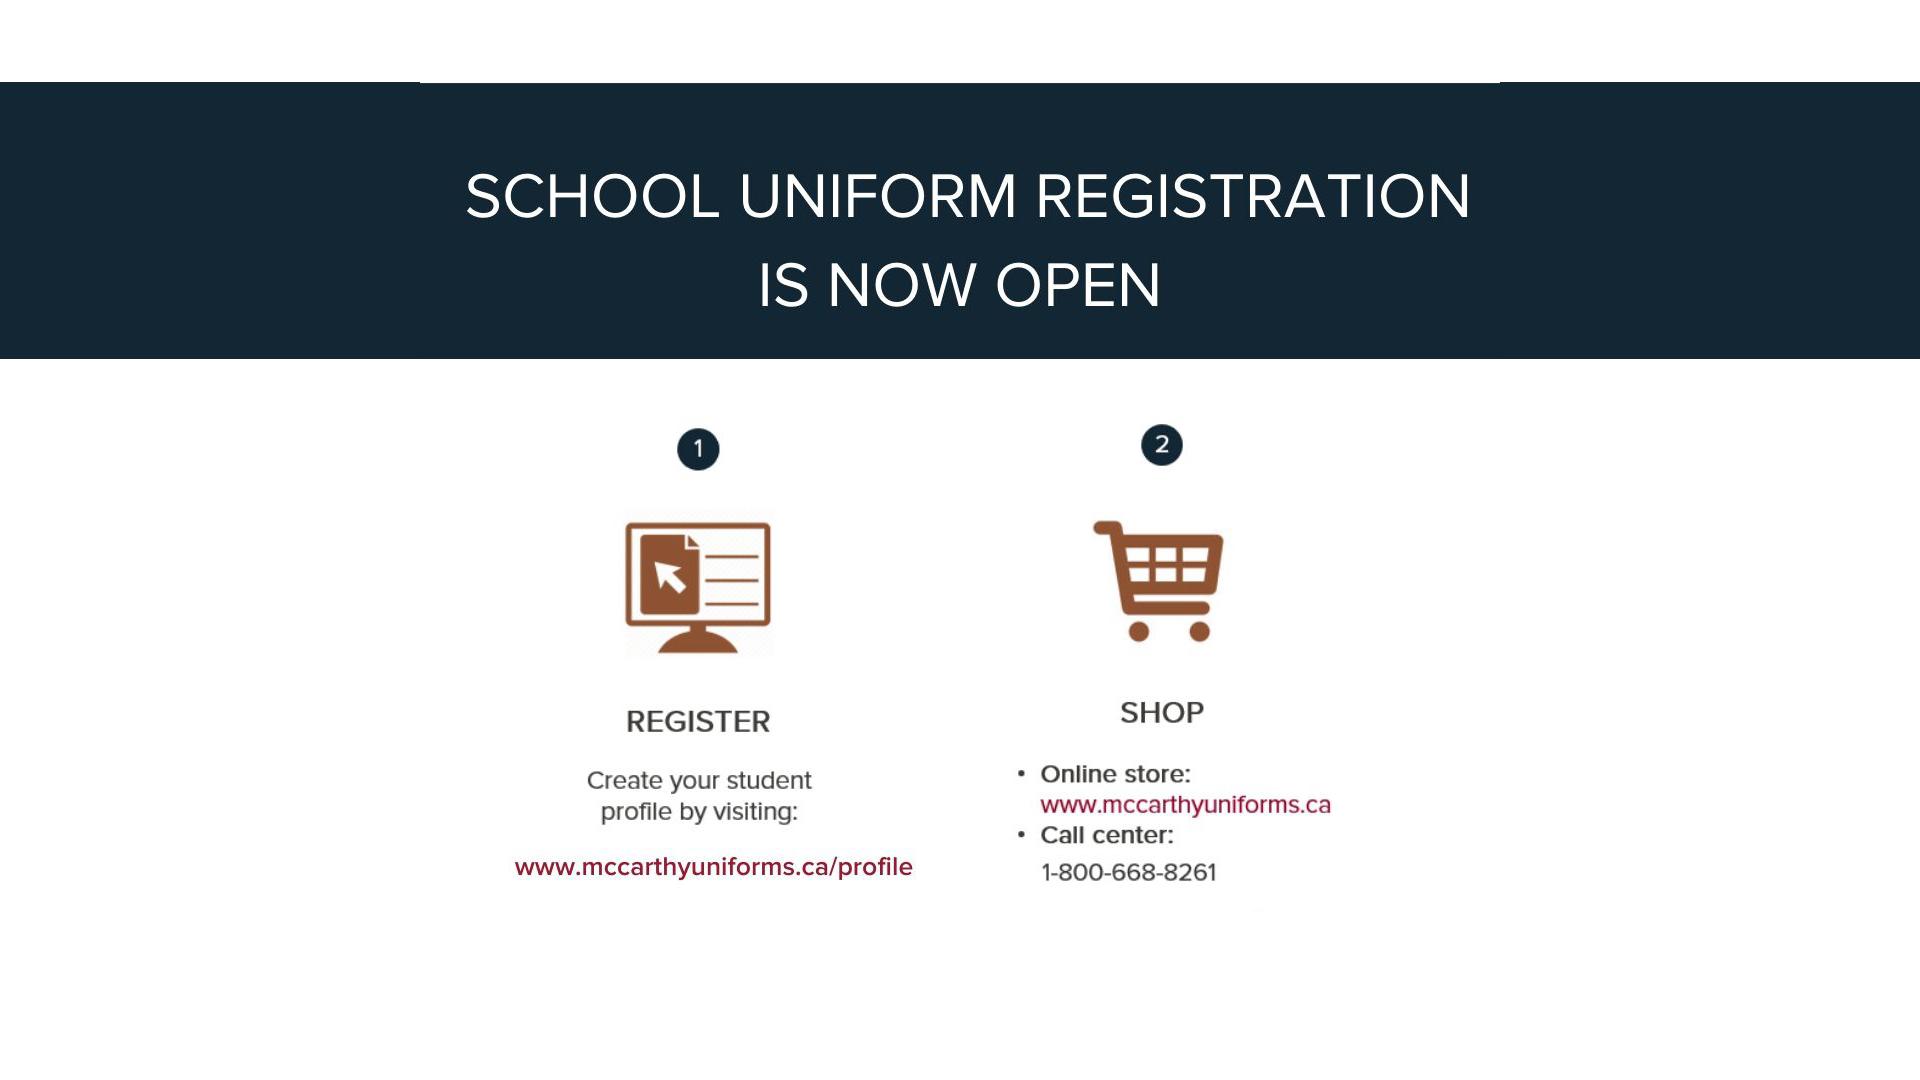 uniformregistration.jpg